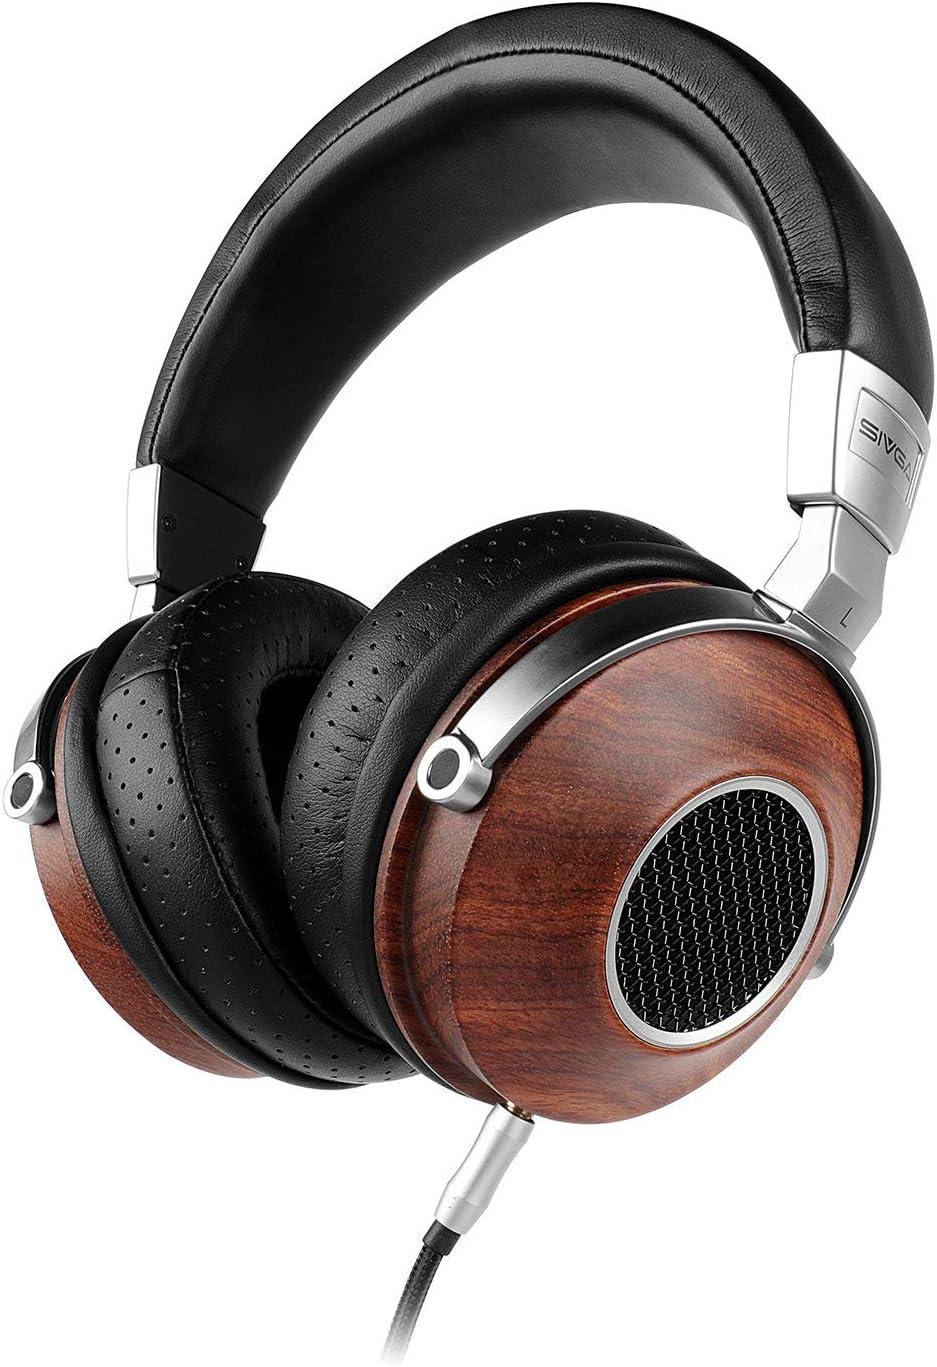 5. SIVGA SV007 Headphones